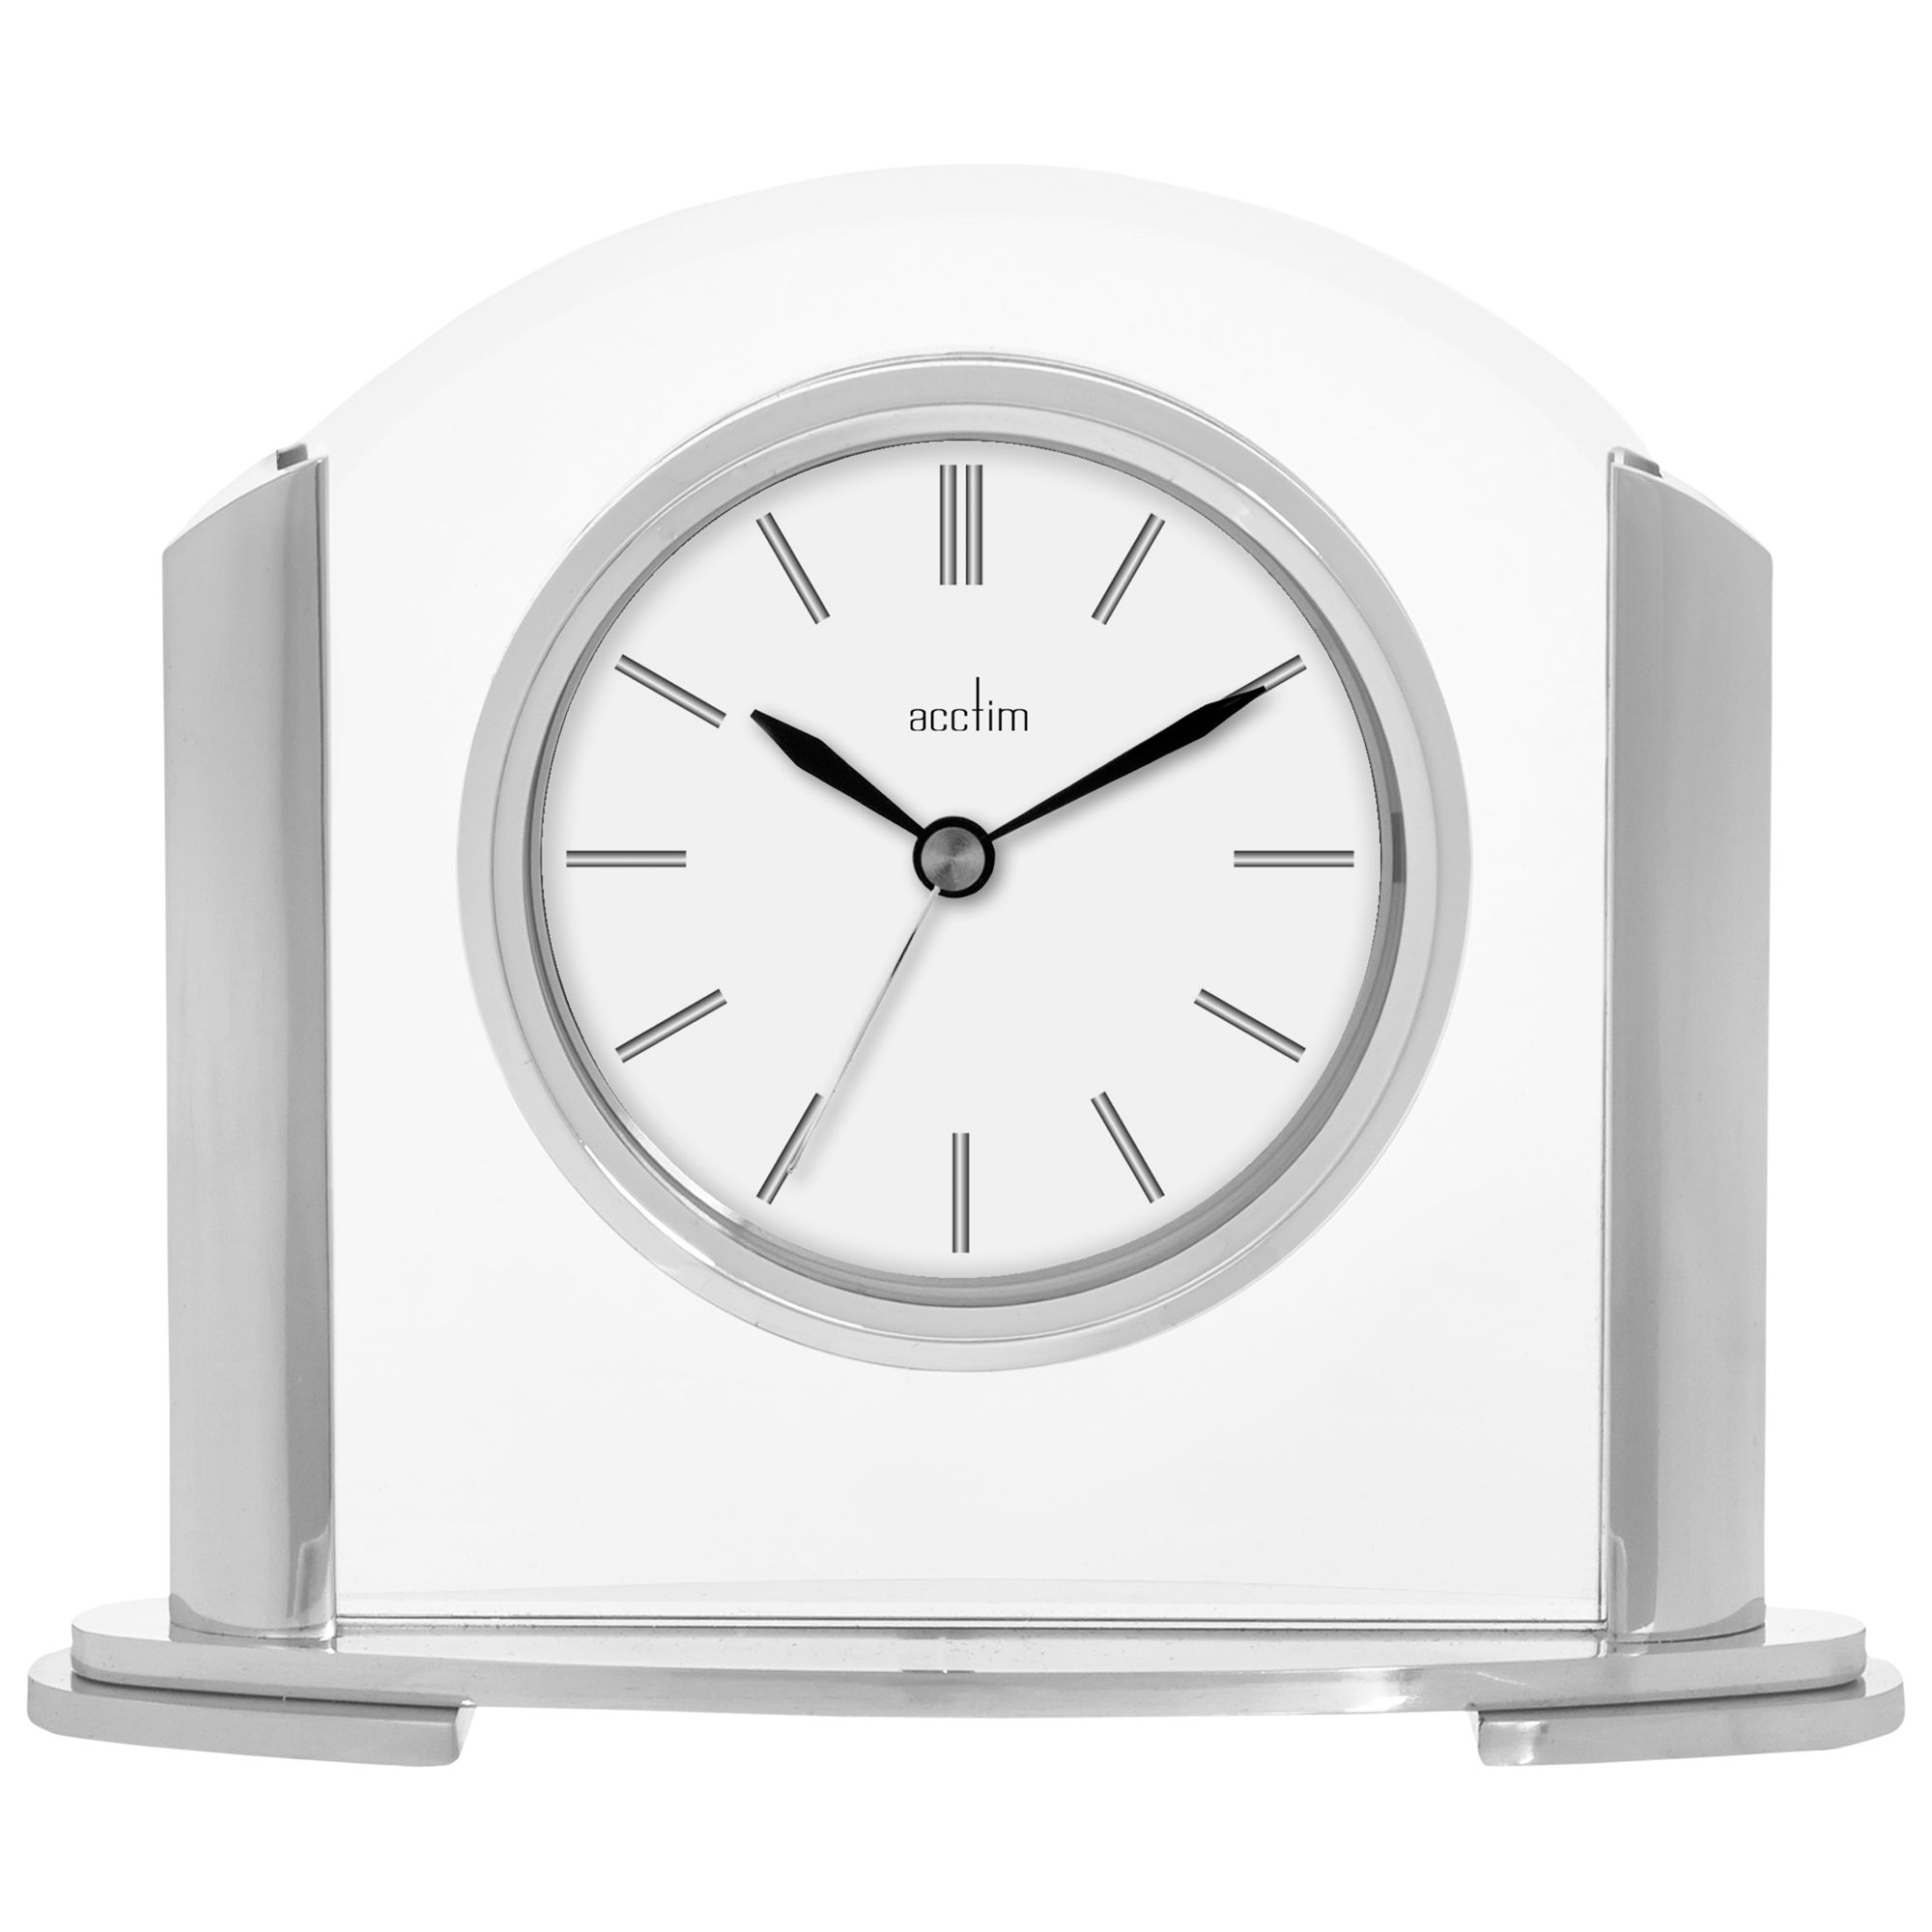 Acctim Acctim Riccia Mantel Clock, Silver